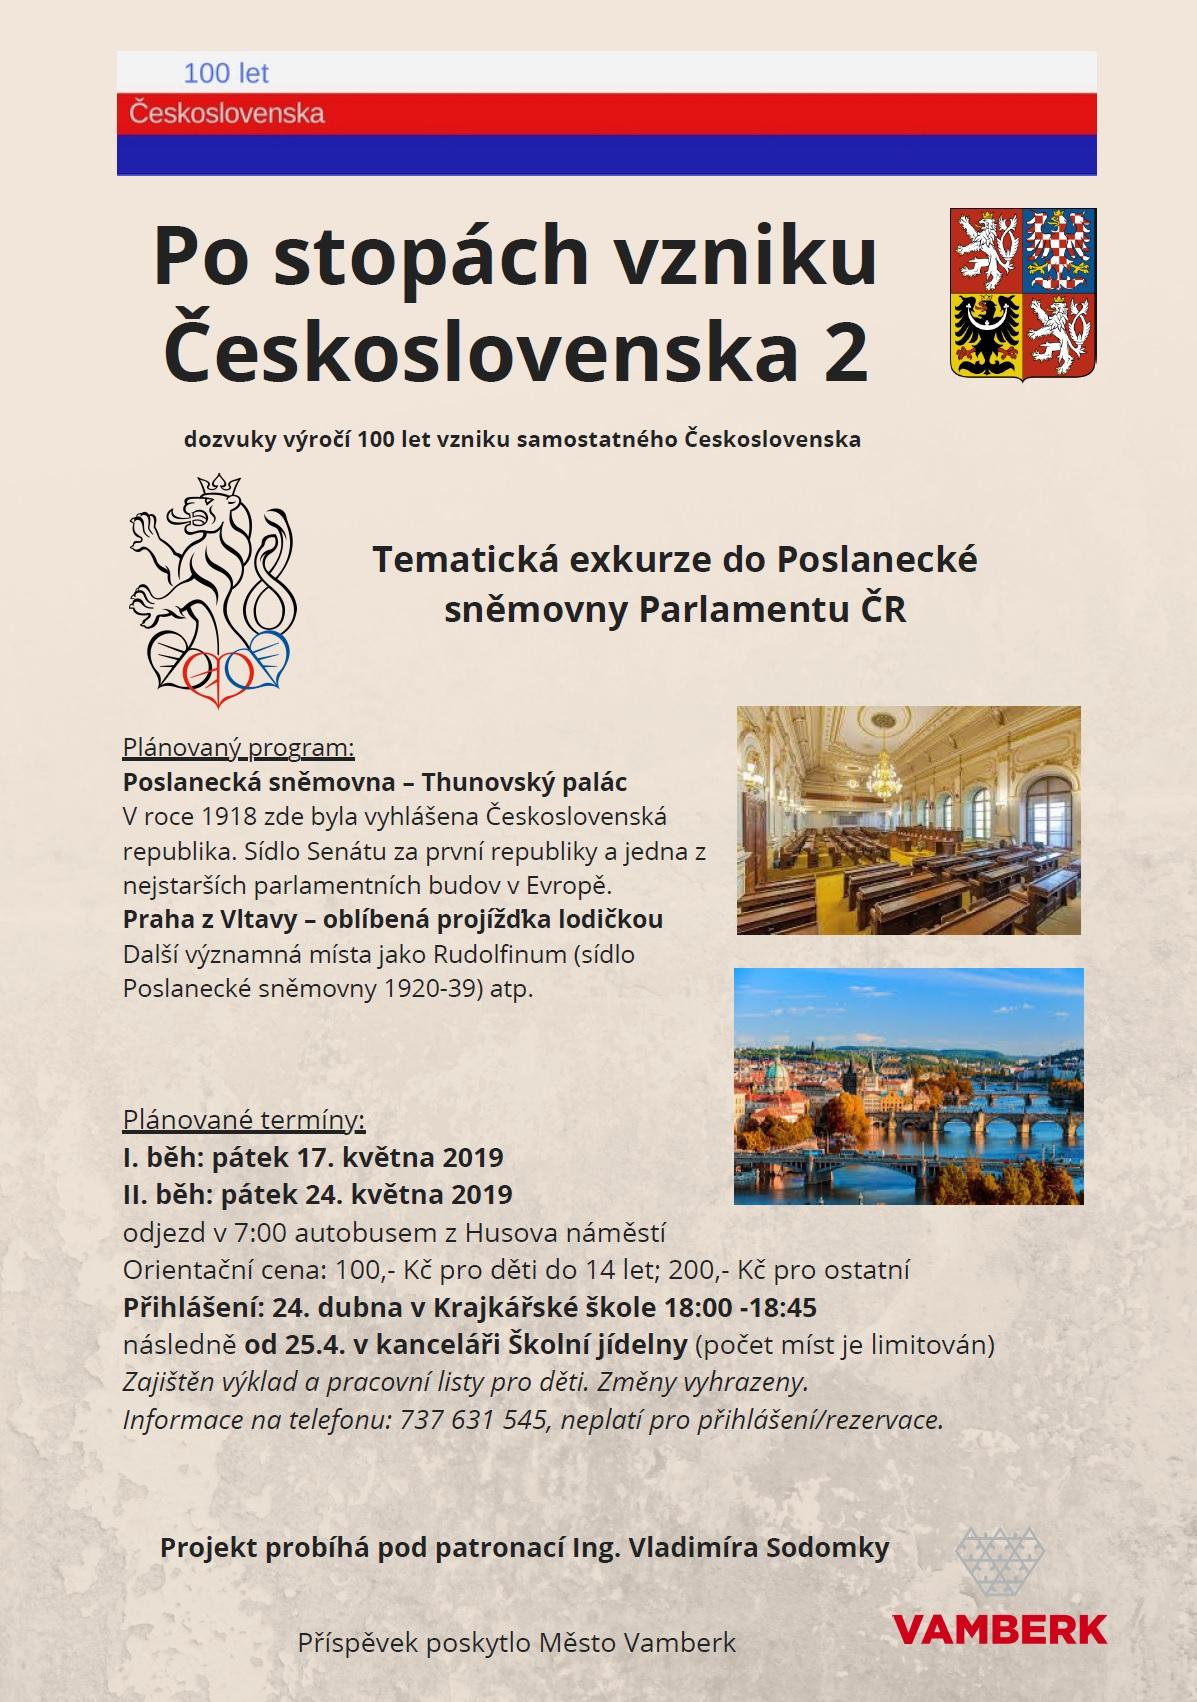 17. a 24.05.2019 - Po stopách vzniku Československa 2